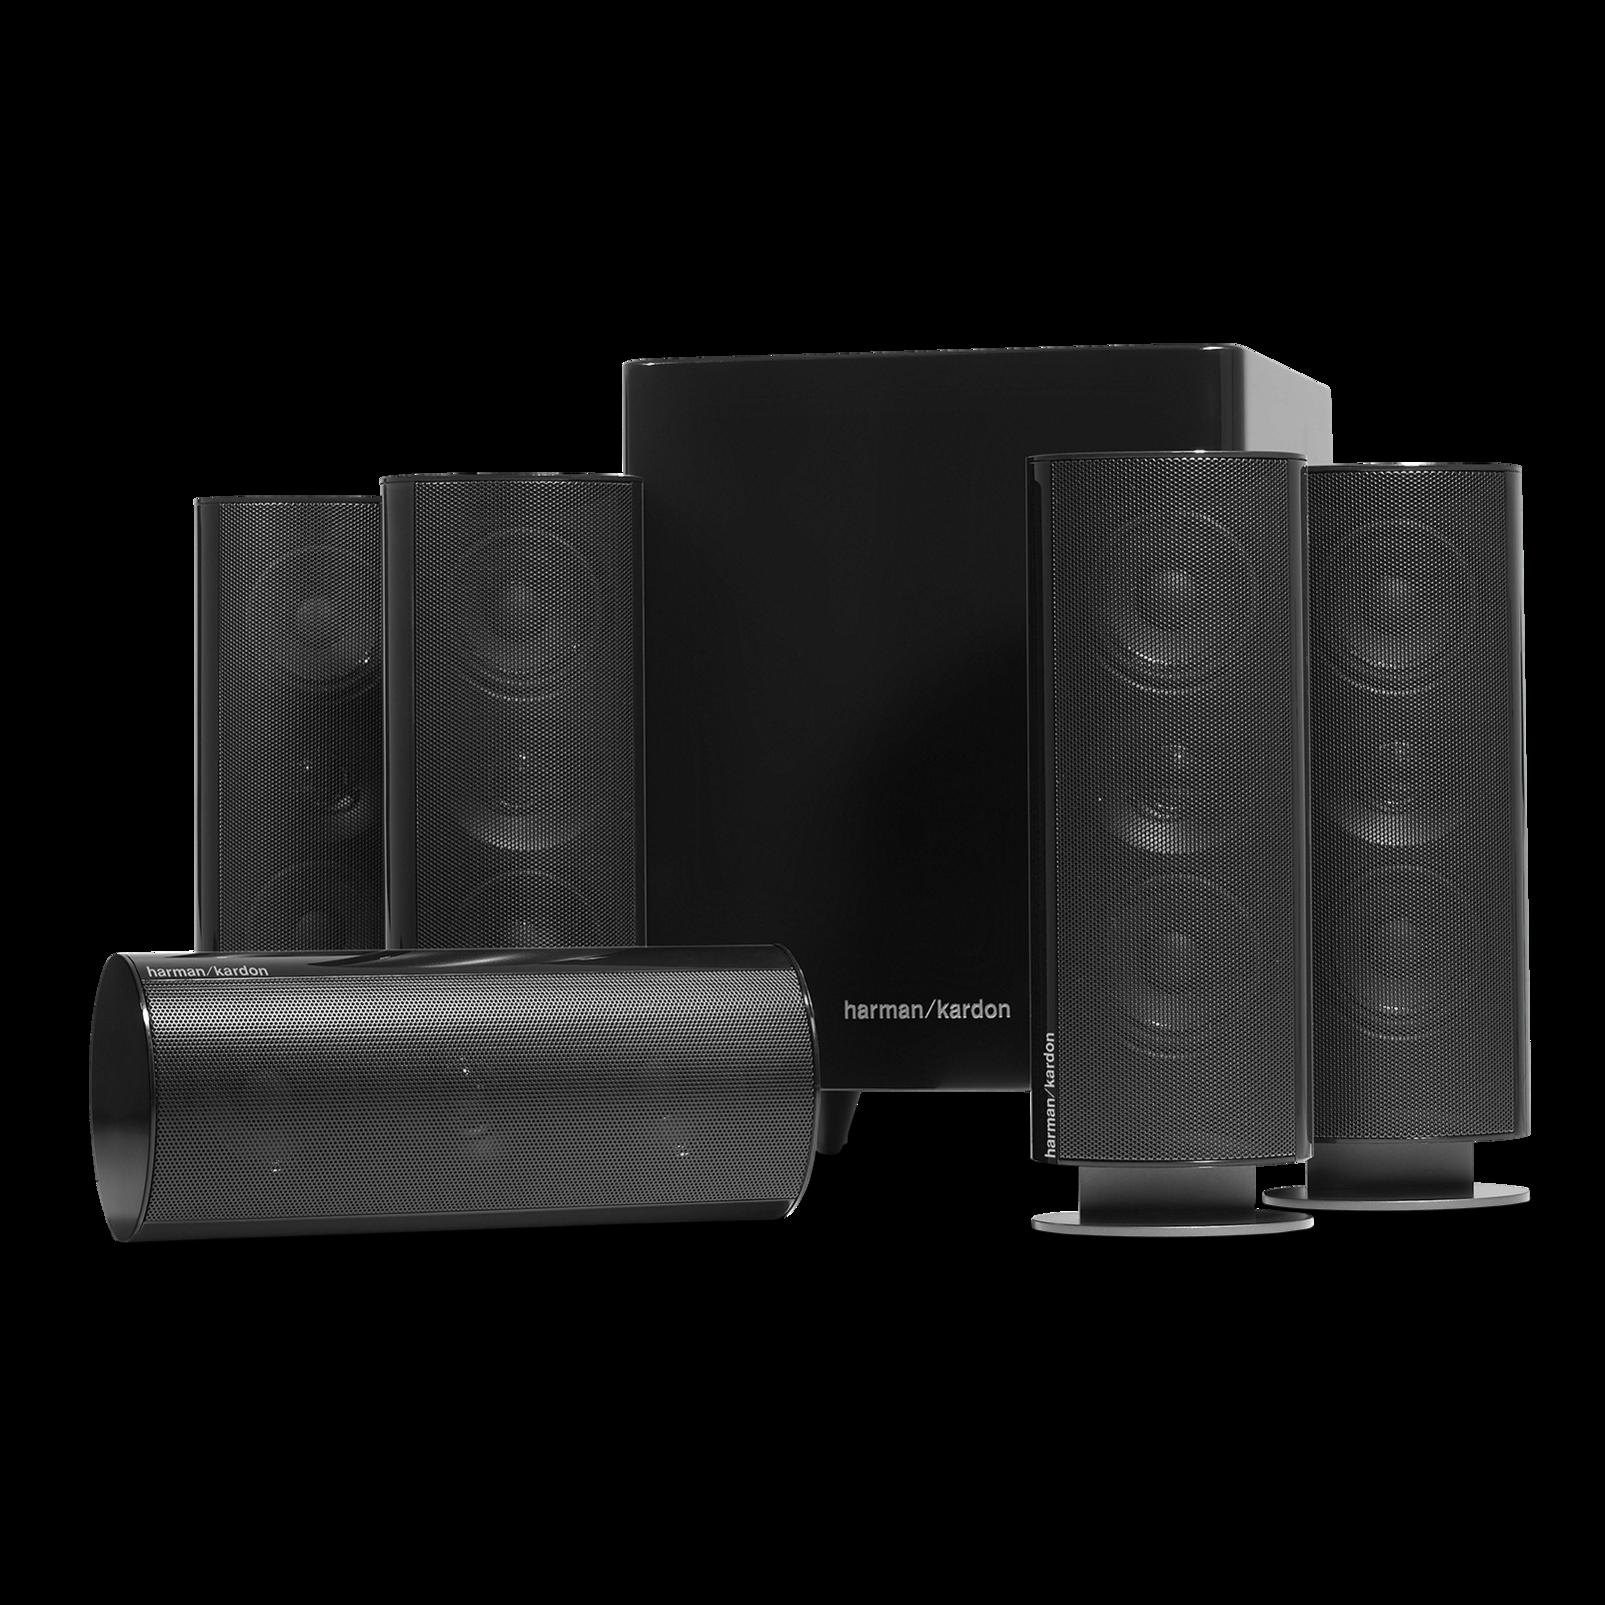 HKTS 30 - Black - 5.1-channel, 120 watt home theater system - Front